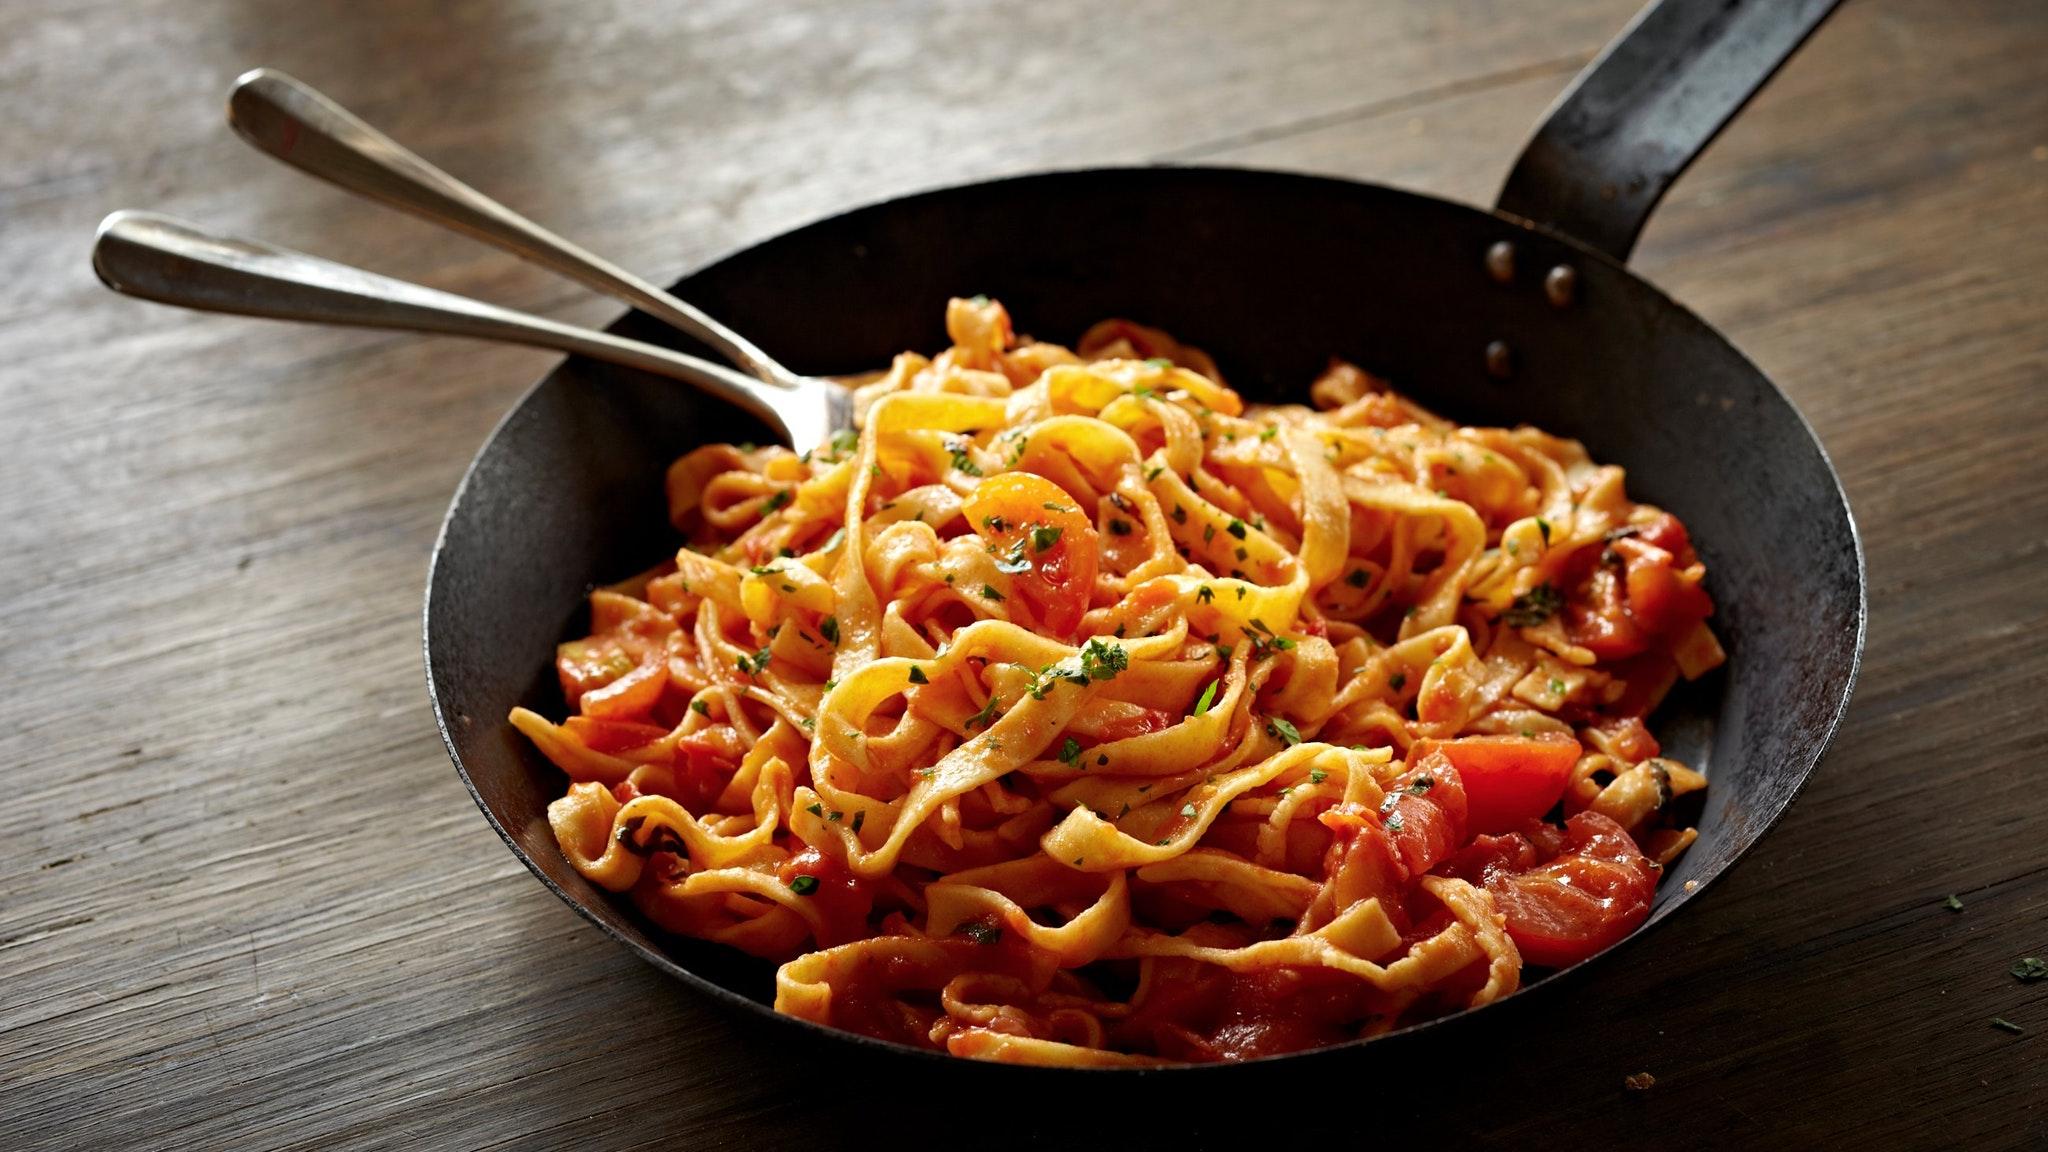 Housemade Pasta